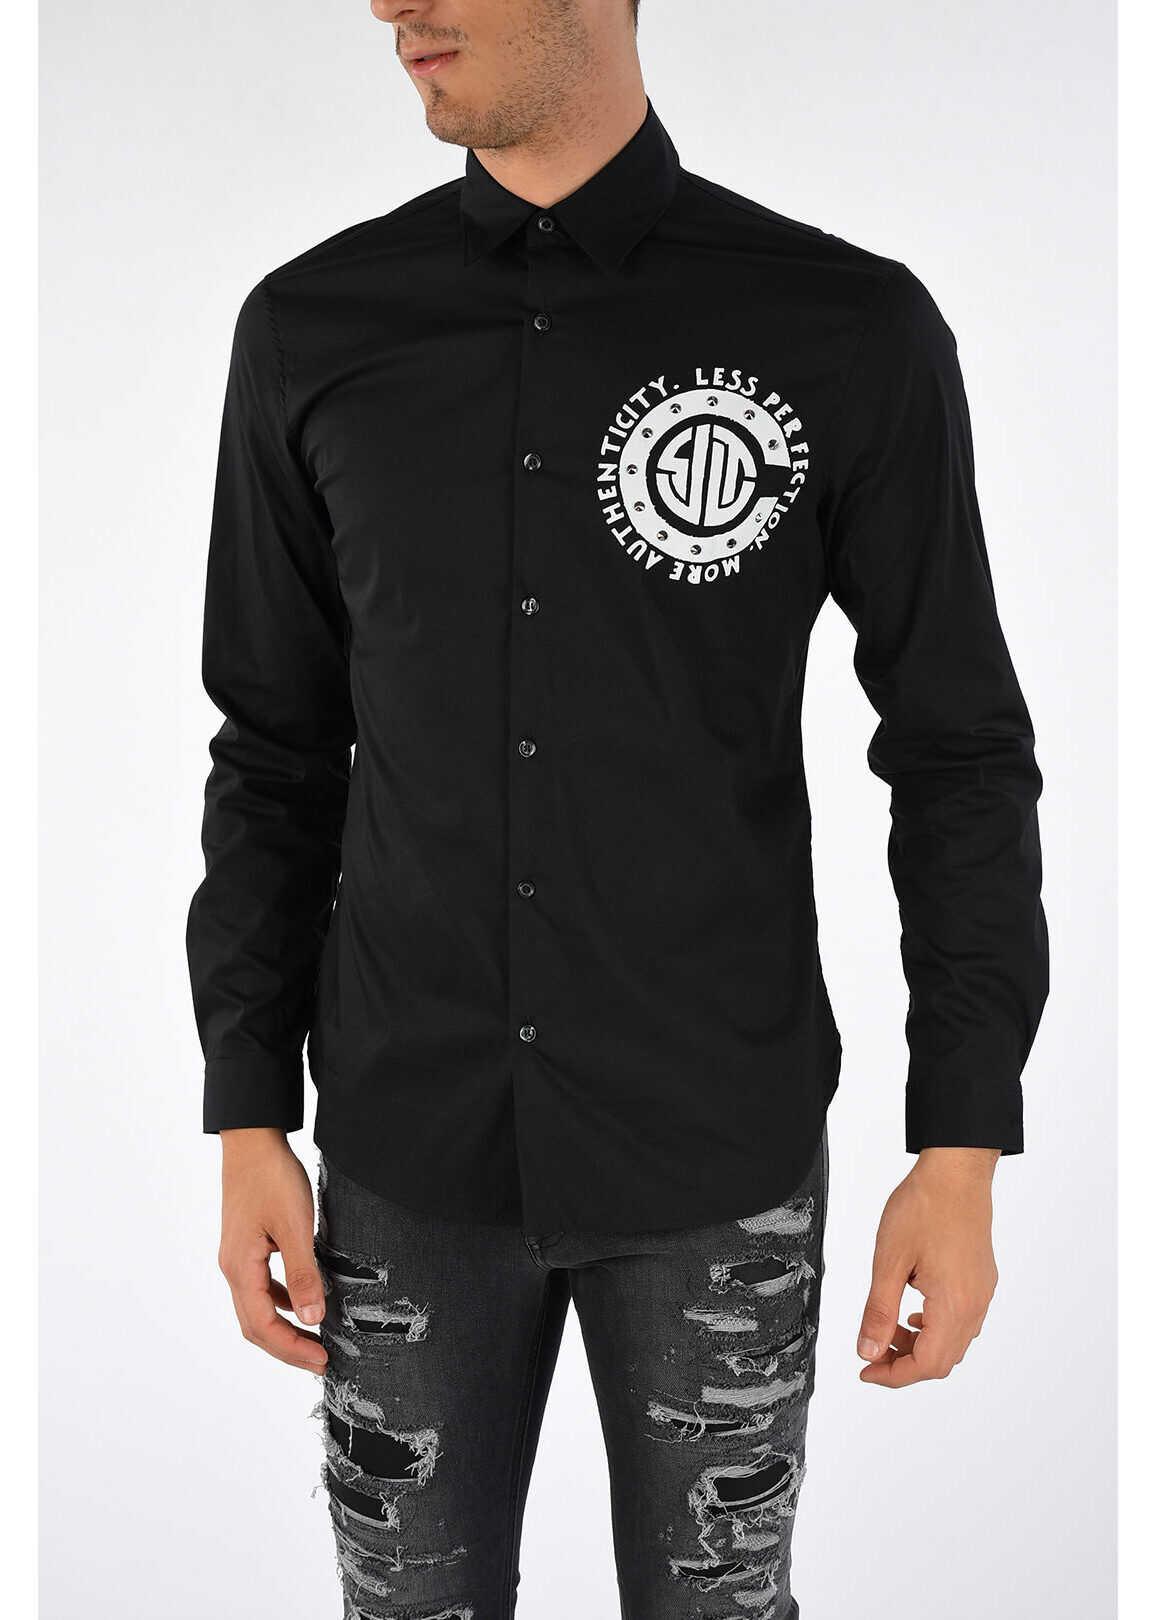 Just Cavalli Printed Shirt with Studs BLACK